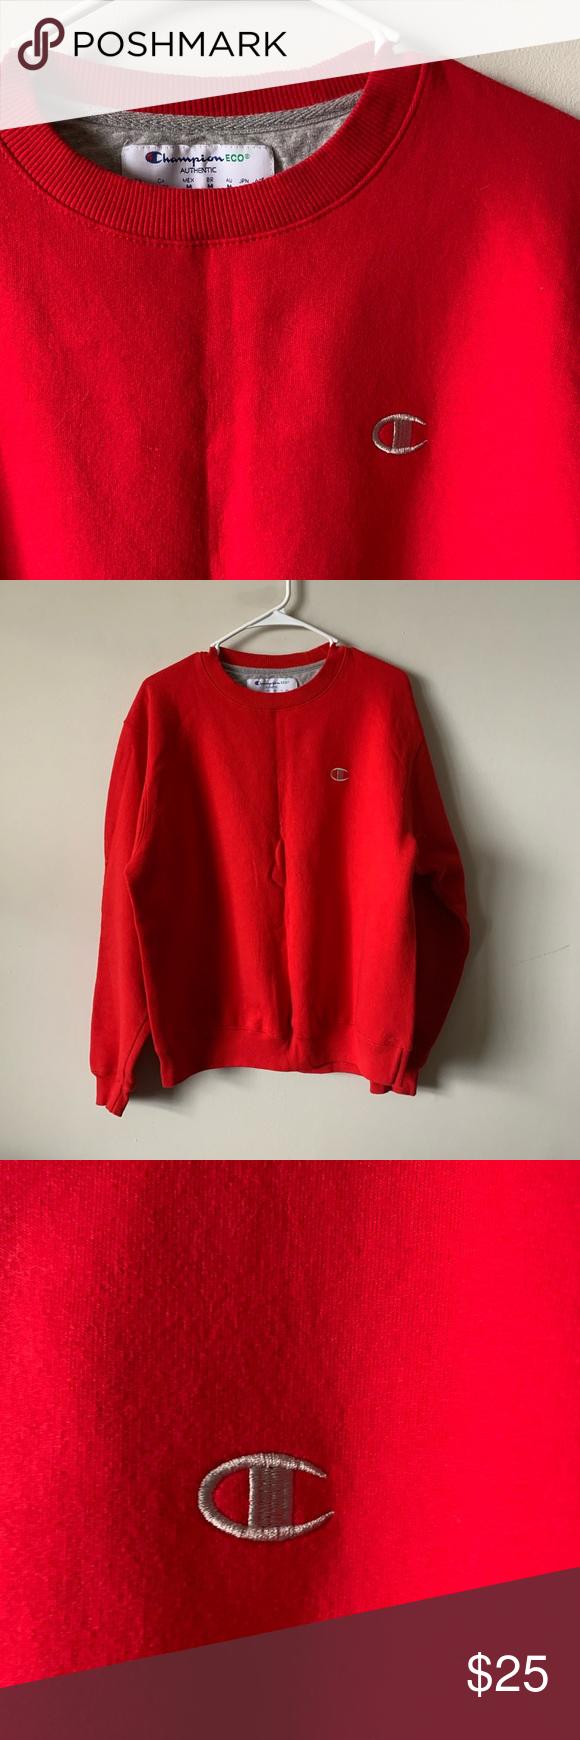 Vintage 90s Red Champion Eco Crewneck Sweatshirt Crew Neck Sweatshirt Sweatshirts Sweatshirt Shirt [ 1740 x 580 Pixel ]